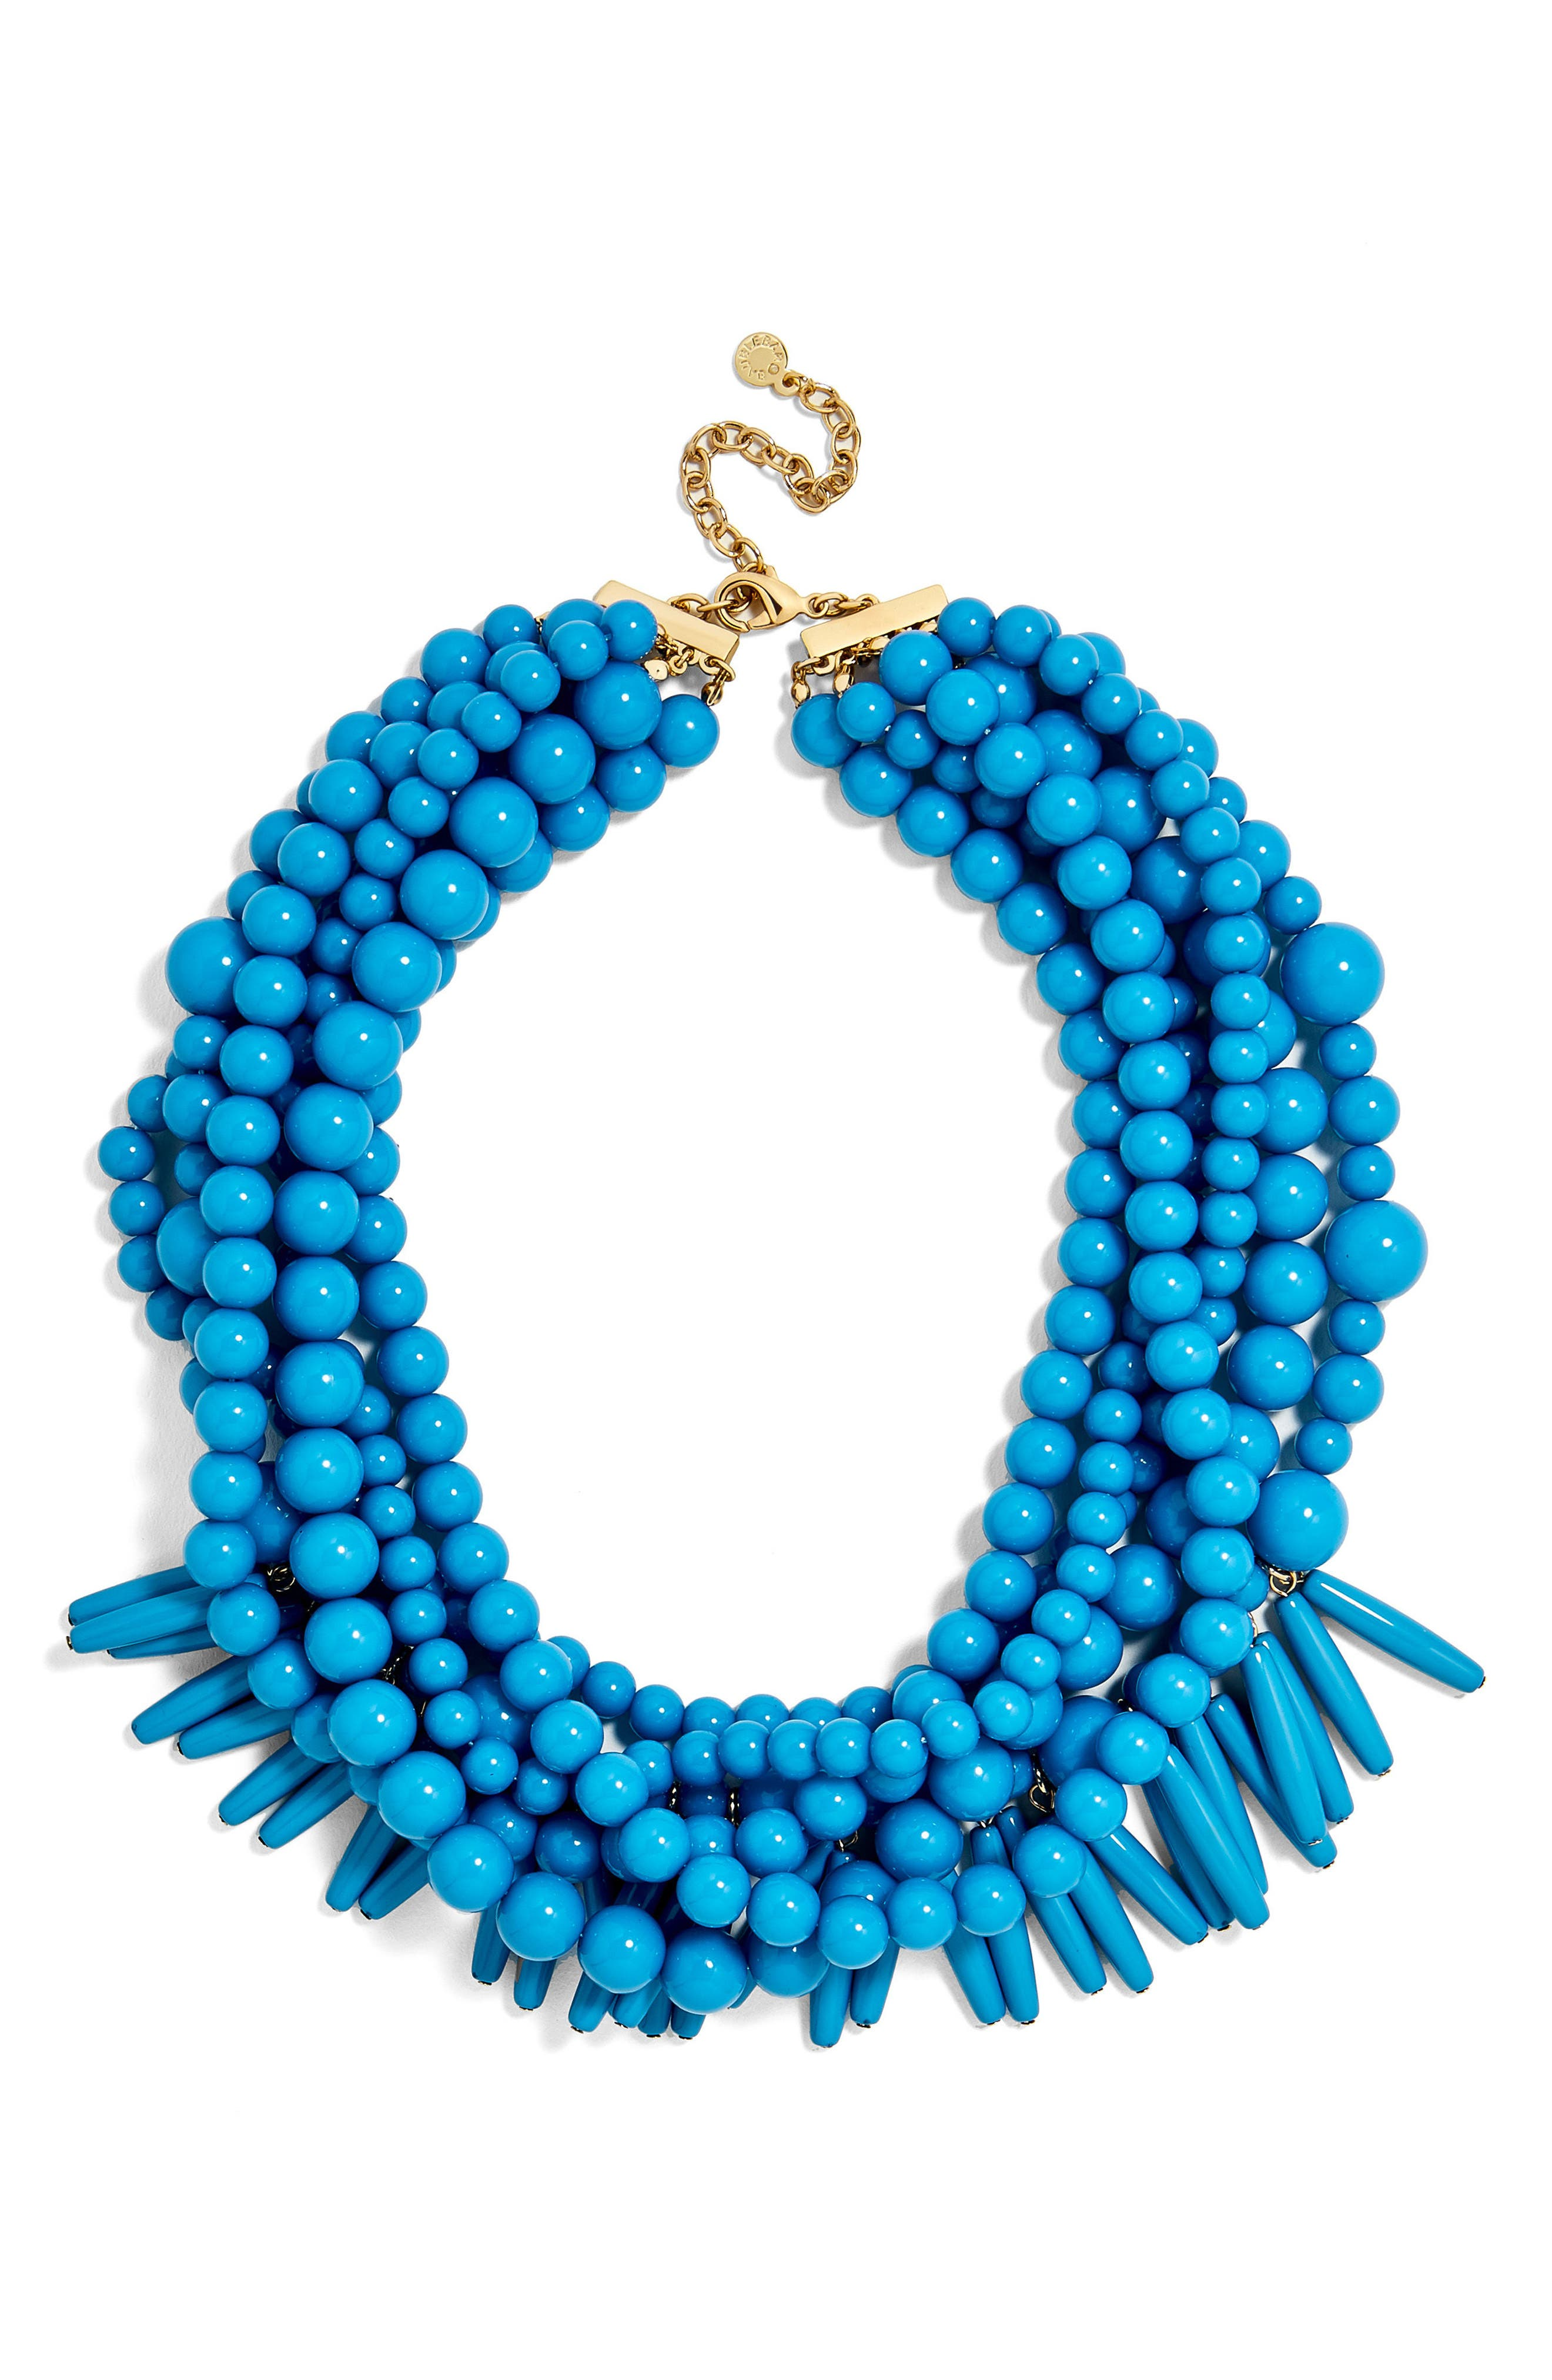 Alternate Image 1 Selected - BaubleBar Malibu Beaded Necklace